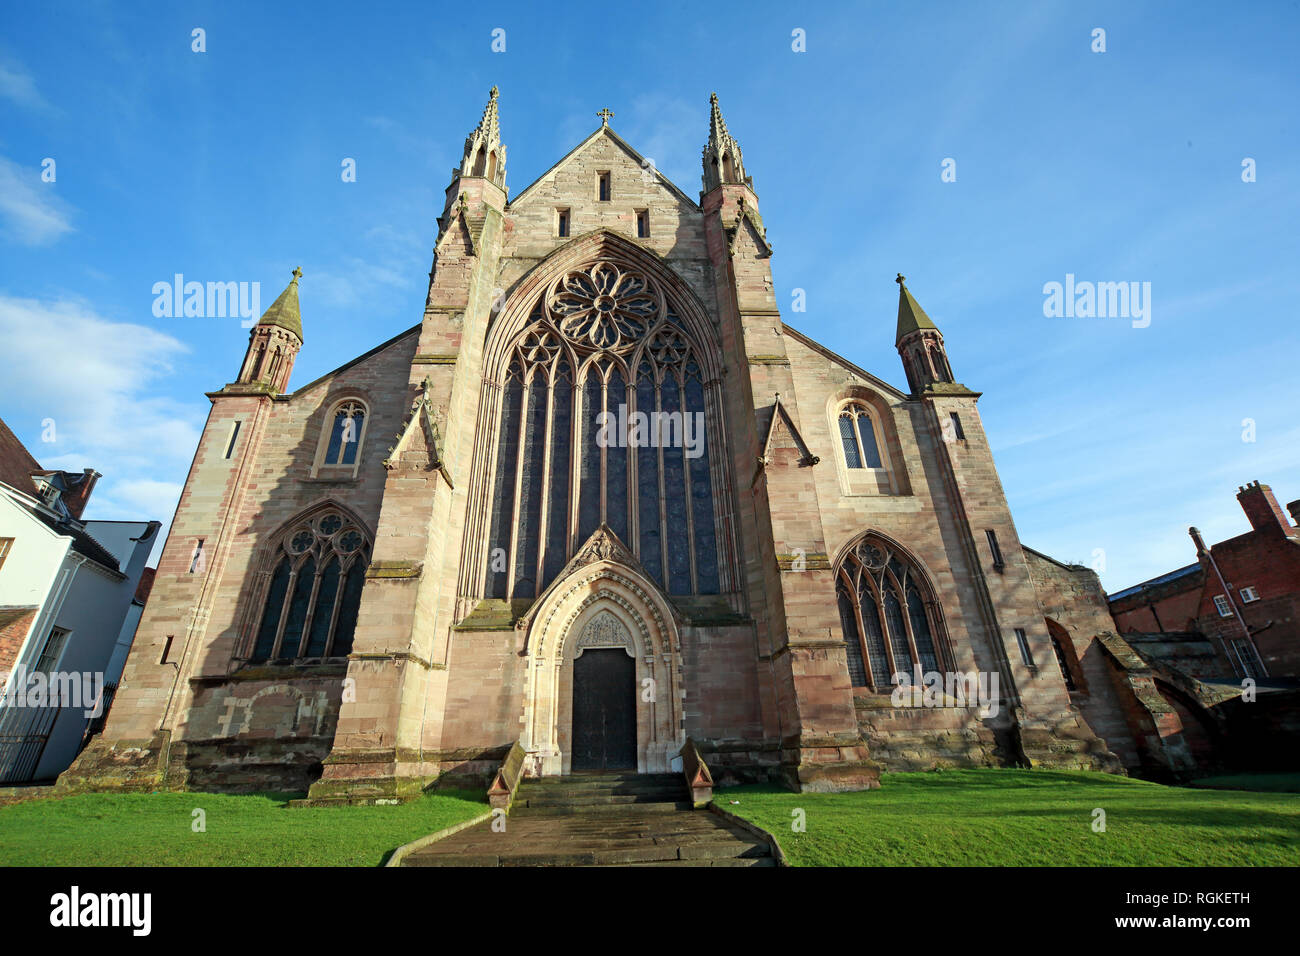 GoTonySmith,@HotpixUK,HotpixUK,religious,building,listed,church,city